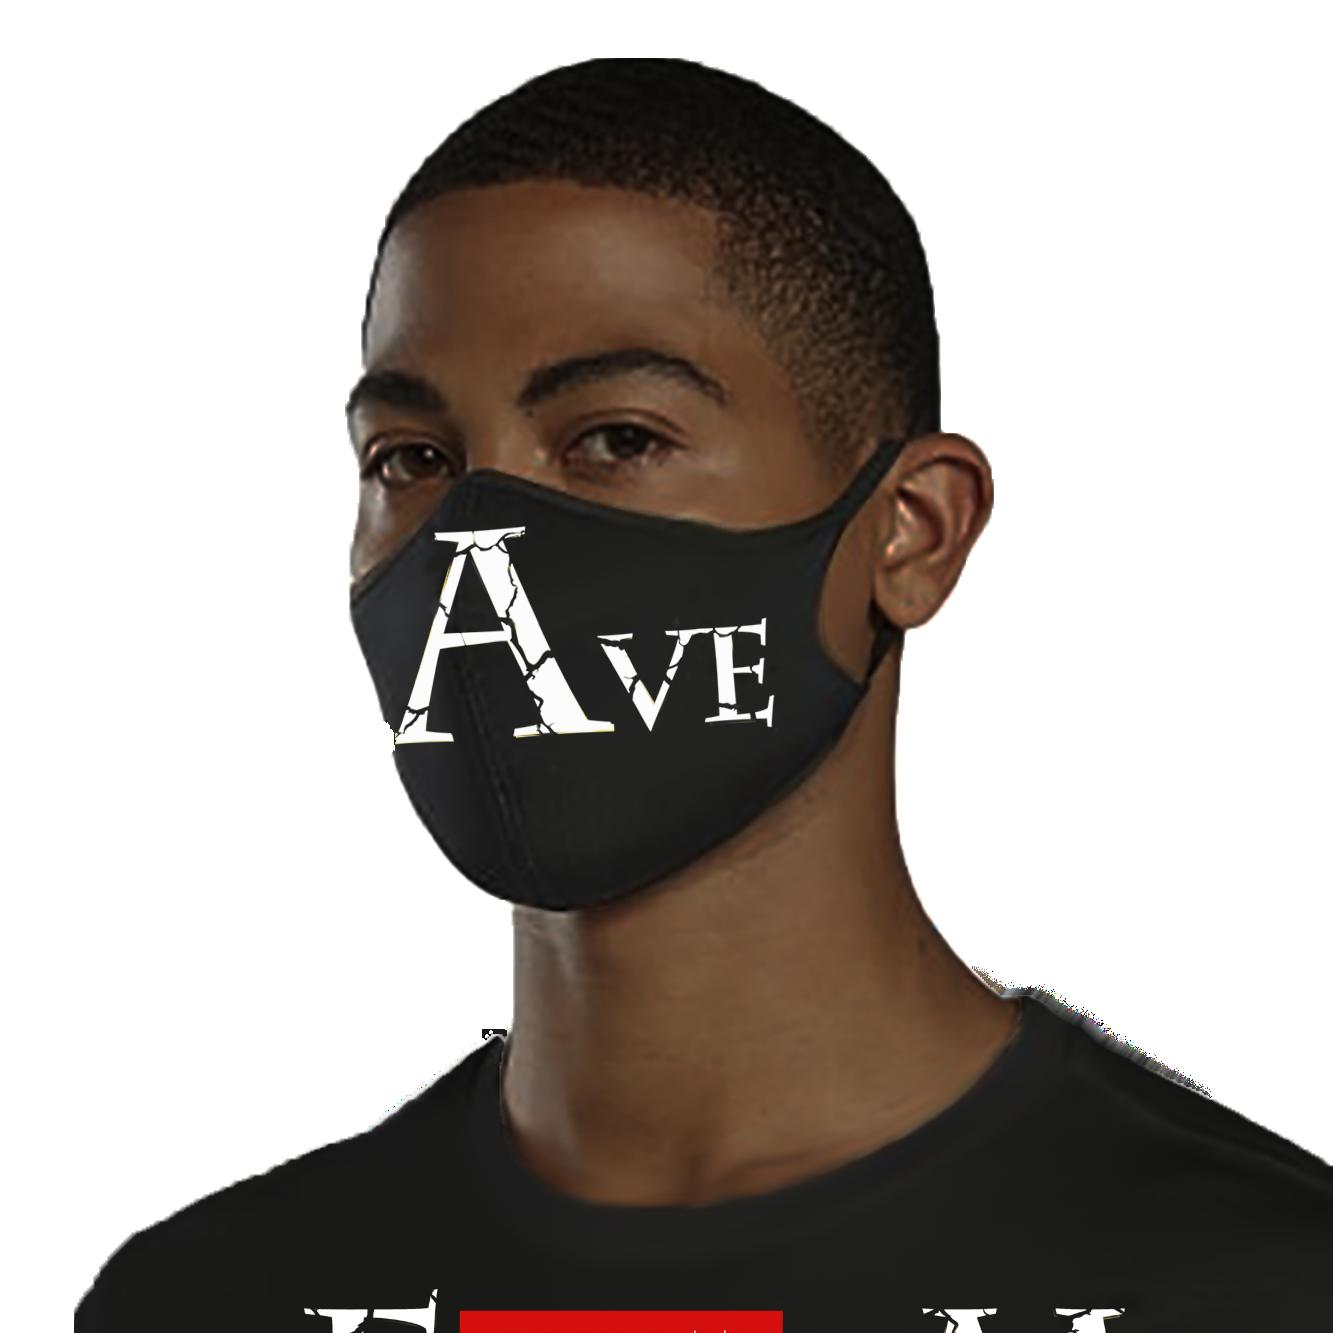 Black Unisex Protective Mask with Slave Design.